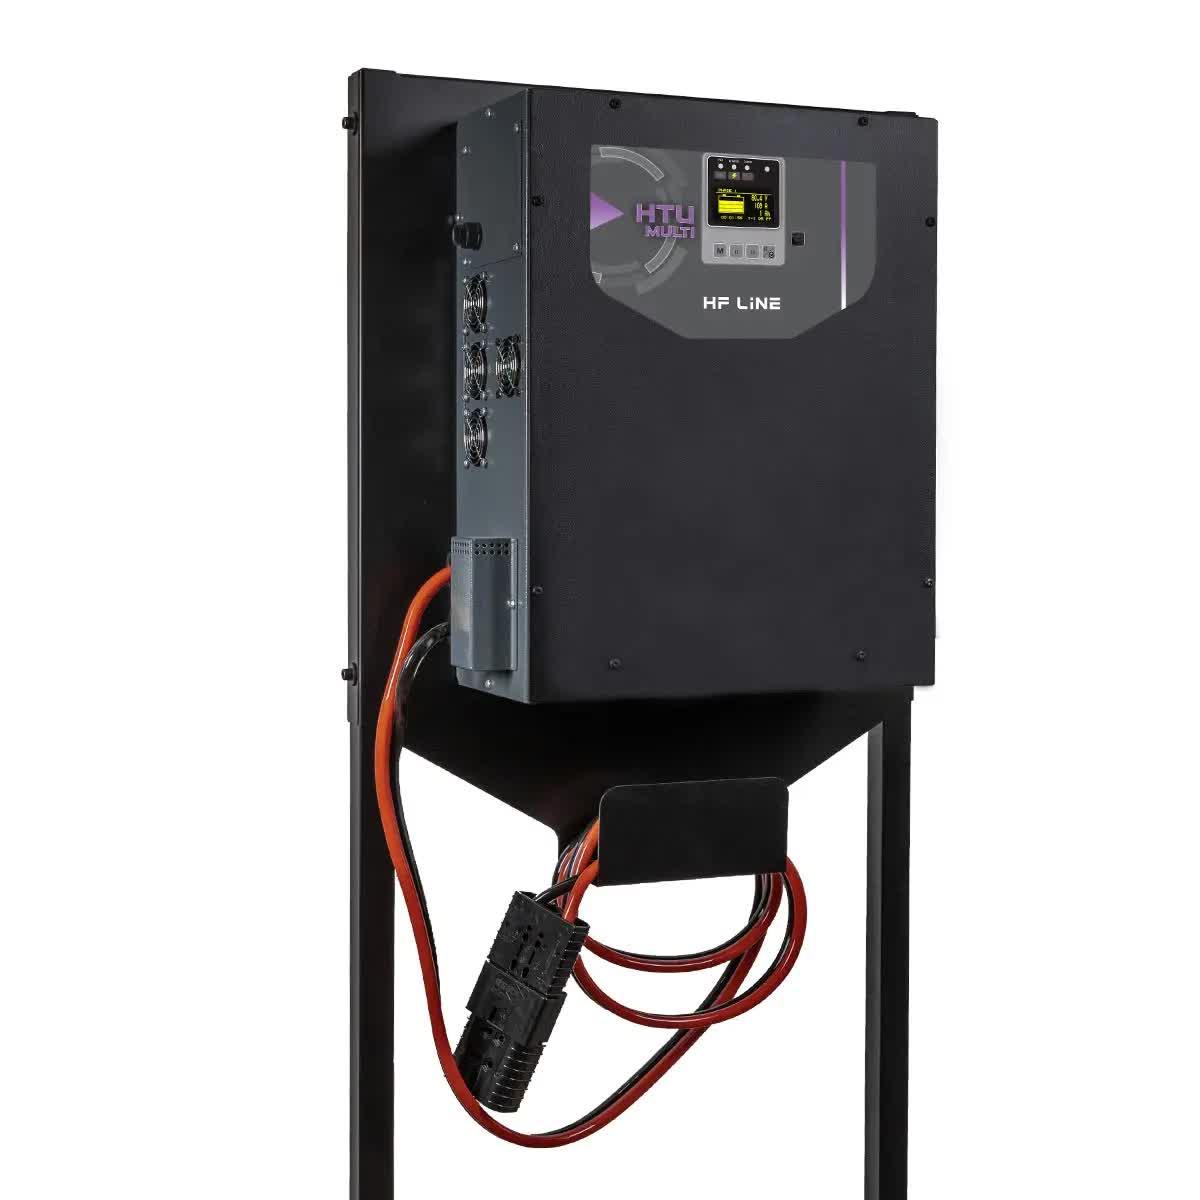 Batteriepflege, Italien, ATIB Elettronica